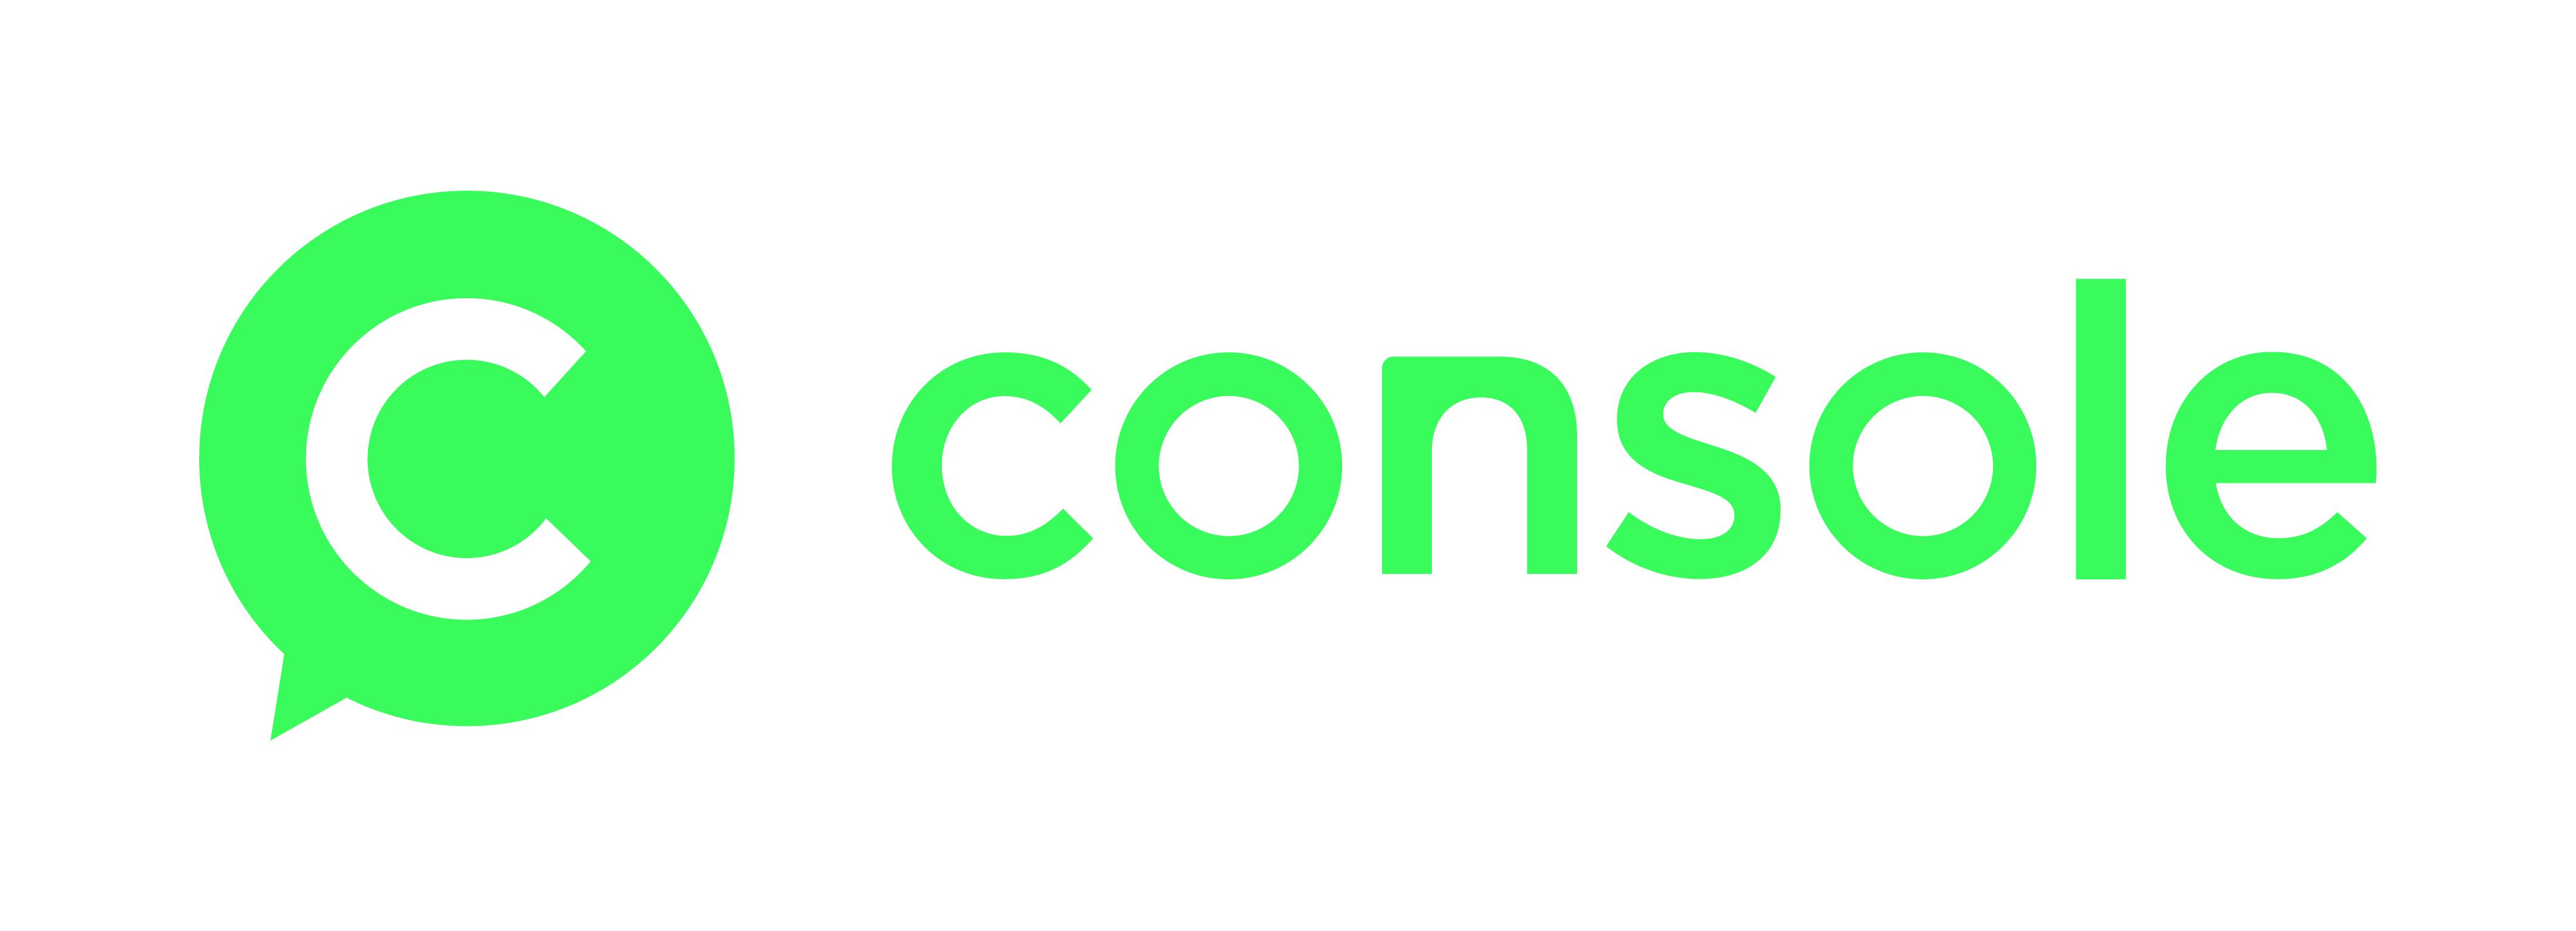 Console - Primary - 1000x305 - 300dpi - CMYK